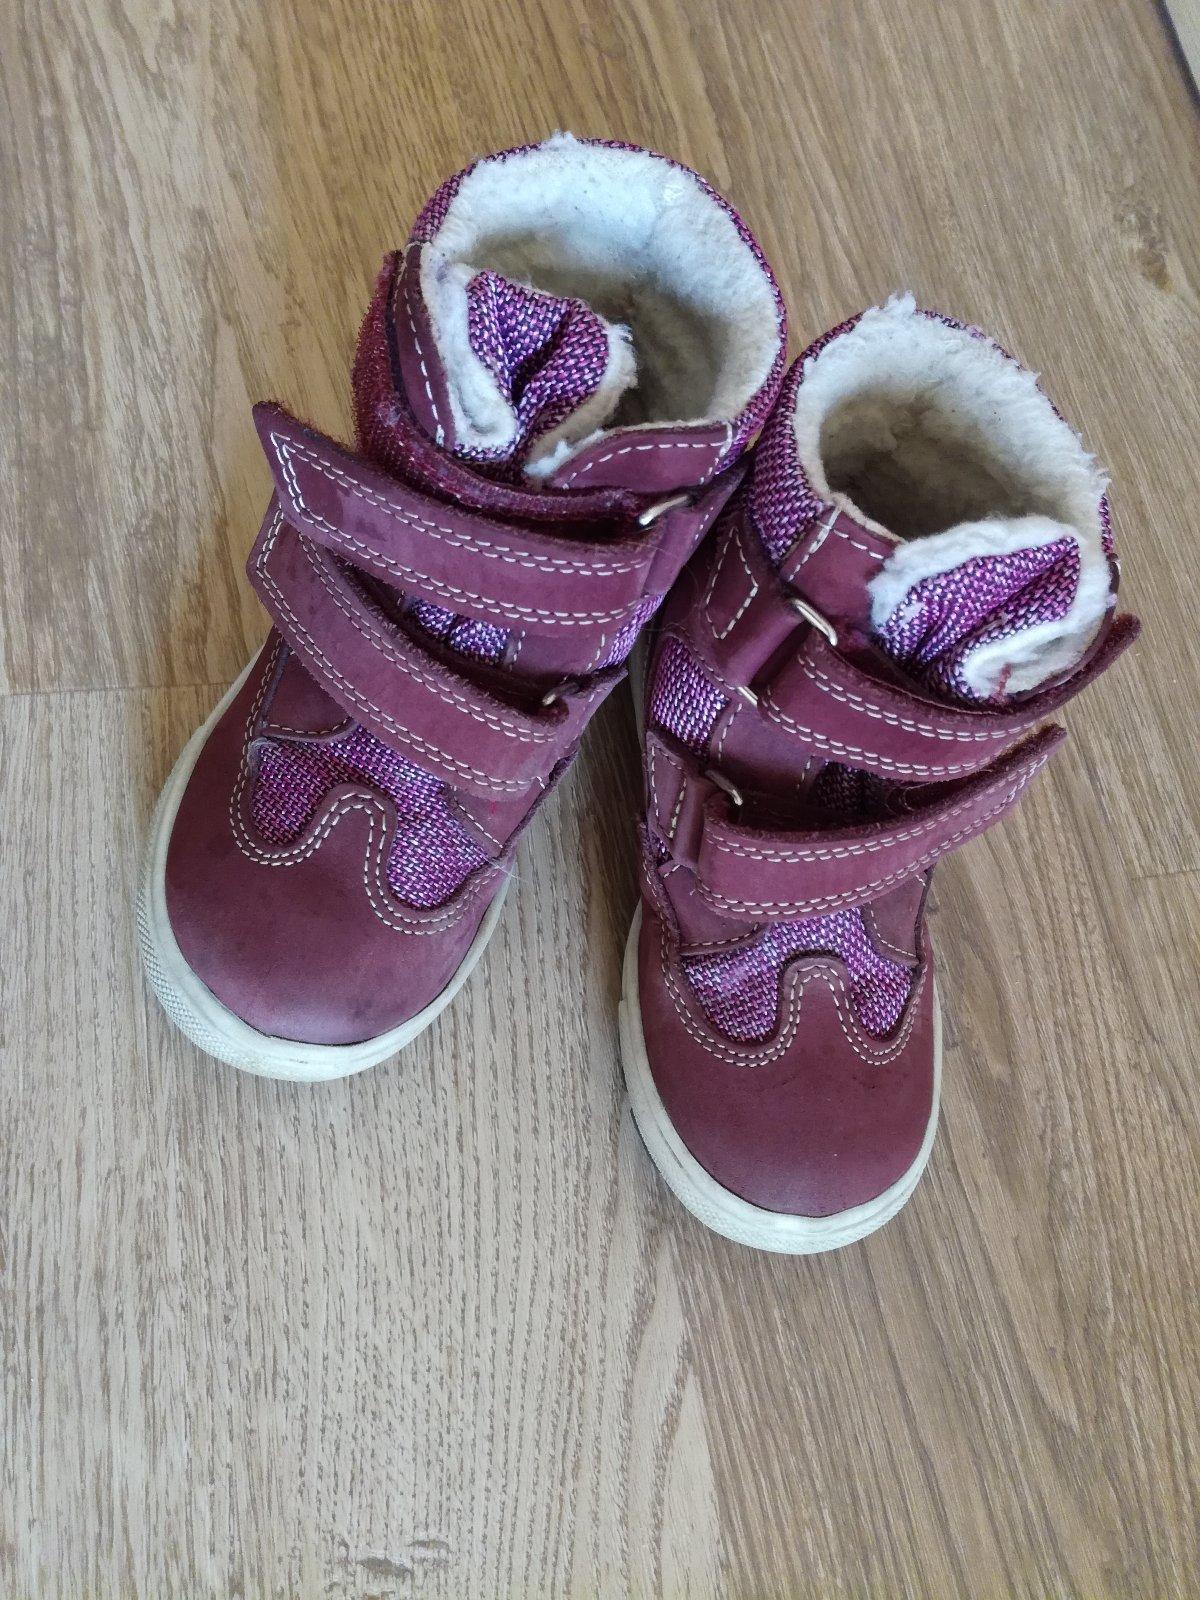 5497d8d3391 Zimní boty zn. jonap vel. 24